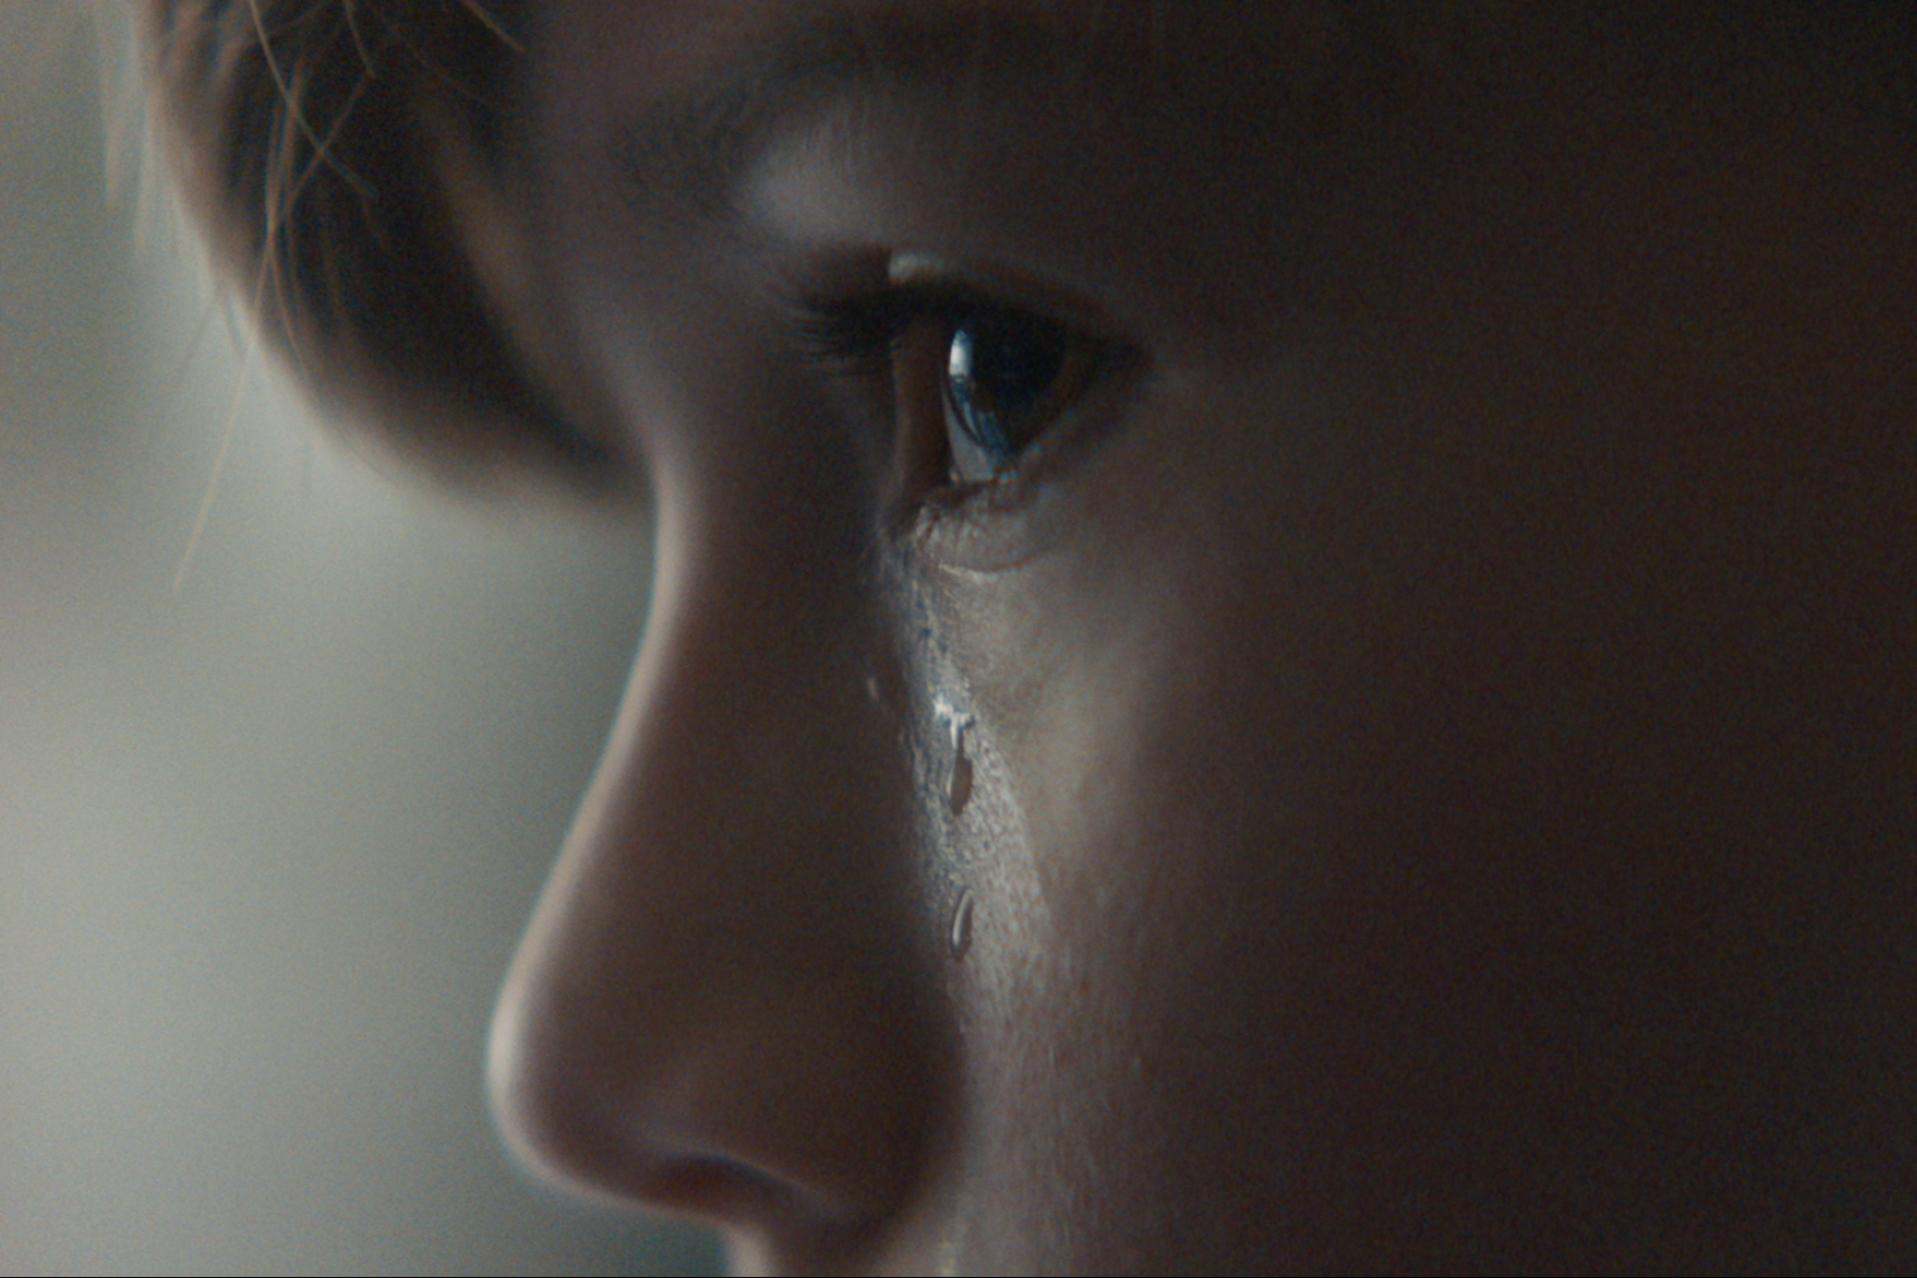 White Ribbon Canada: Boys Don't Cry